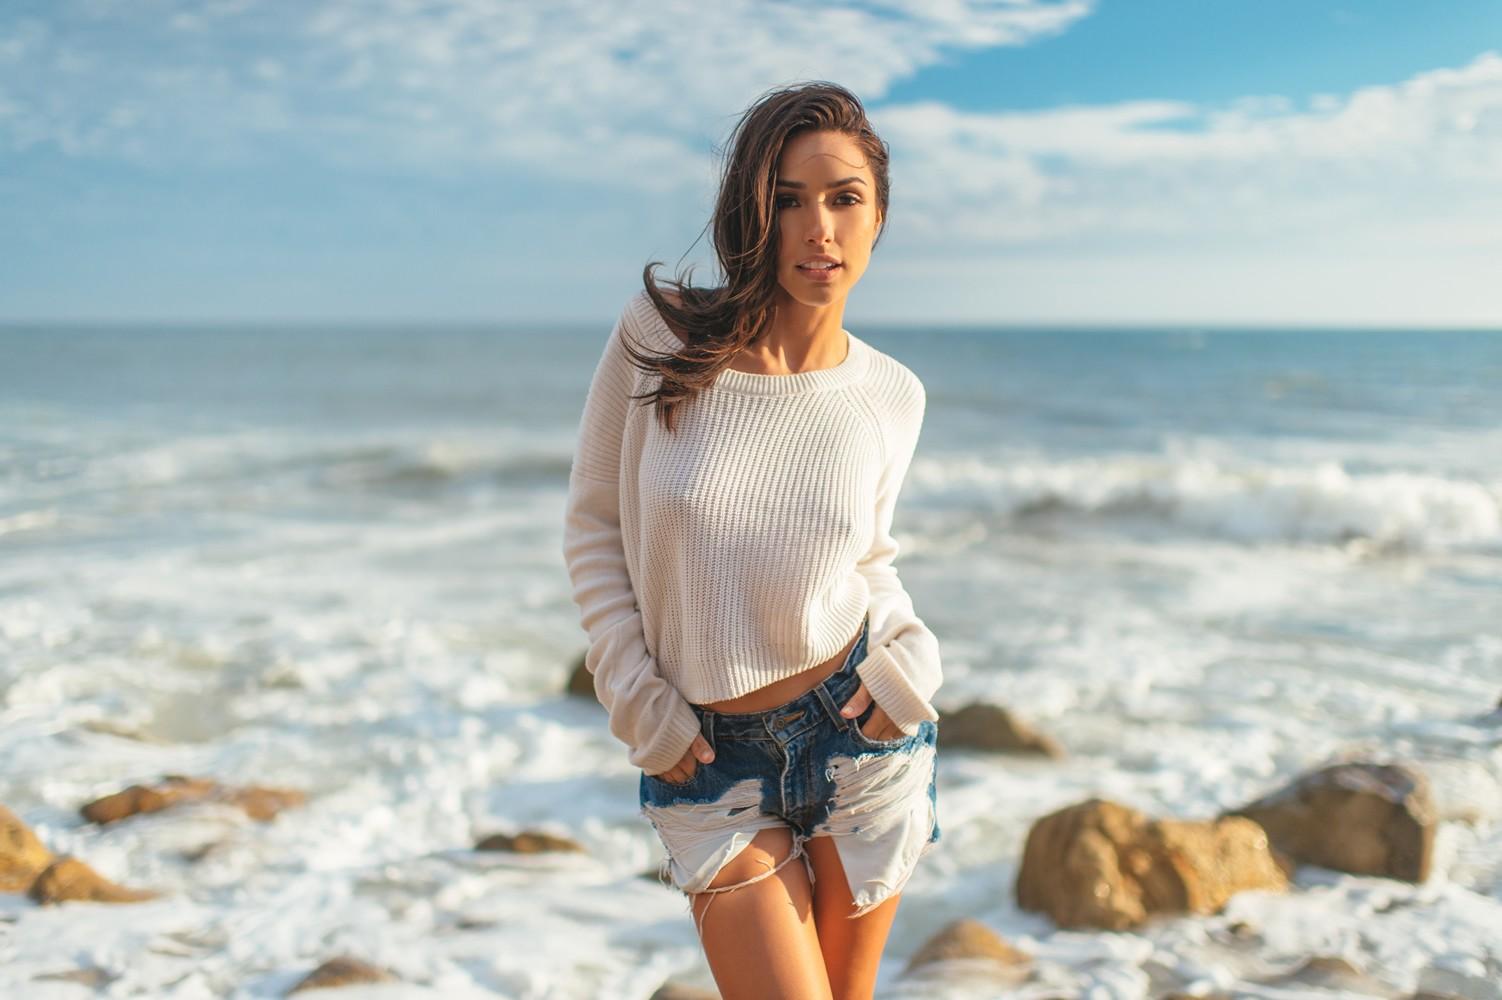 Wallpaper : model, sea, brunette, legs, photography, beach